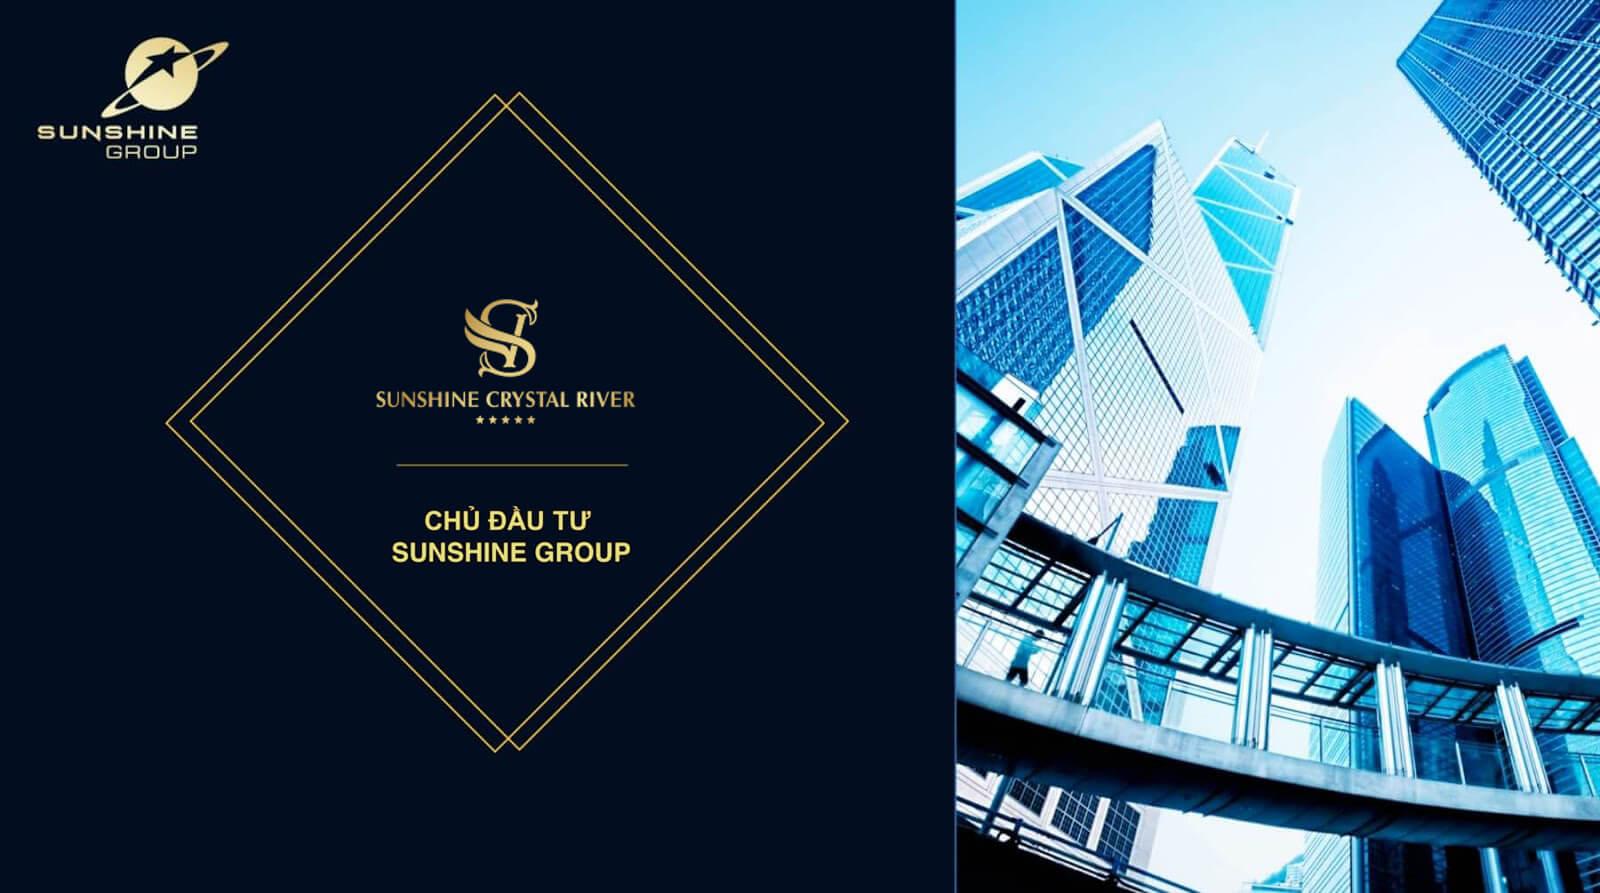 chu-dau-tu-sunshine-group